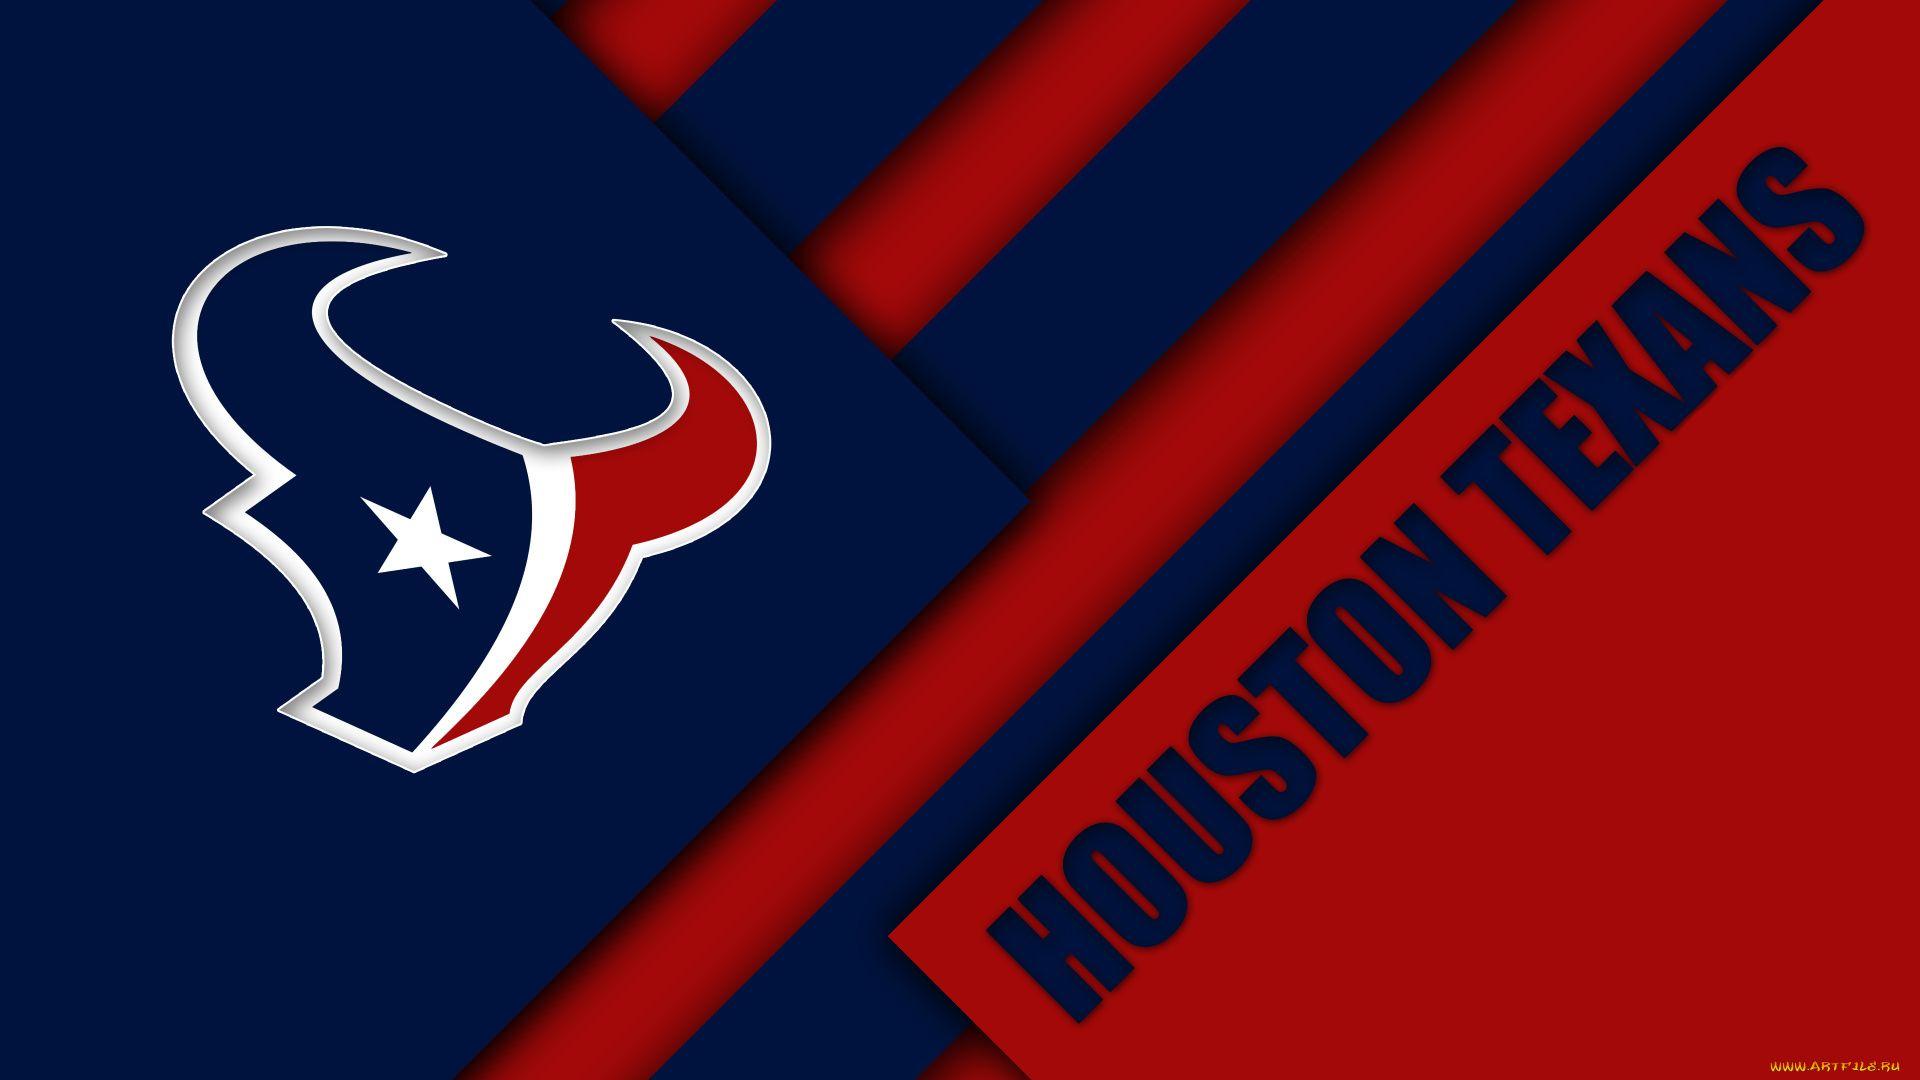 Houston Texans hd